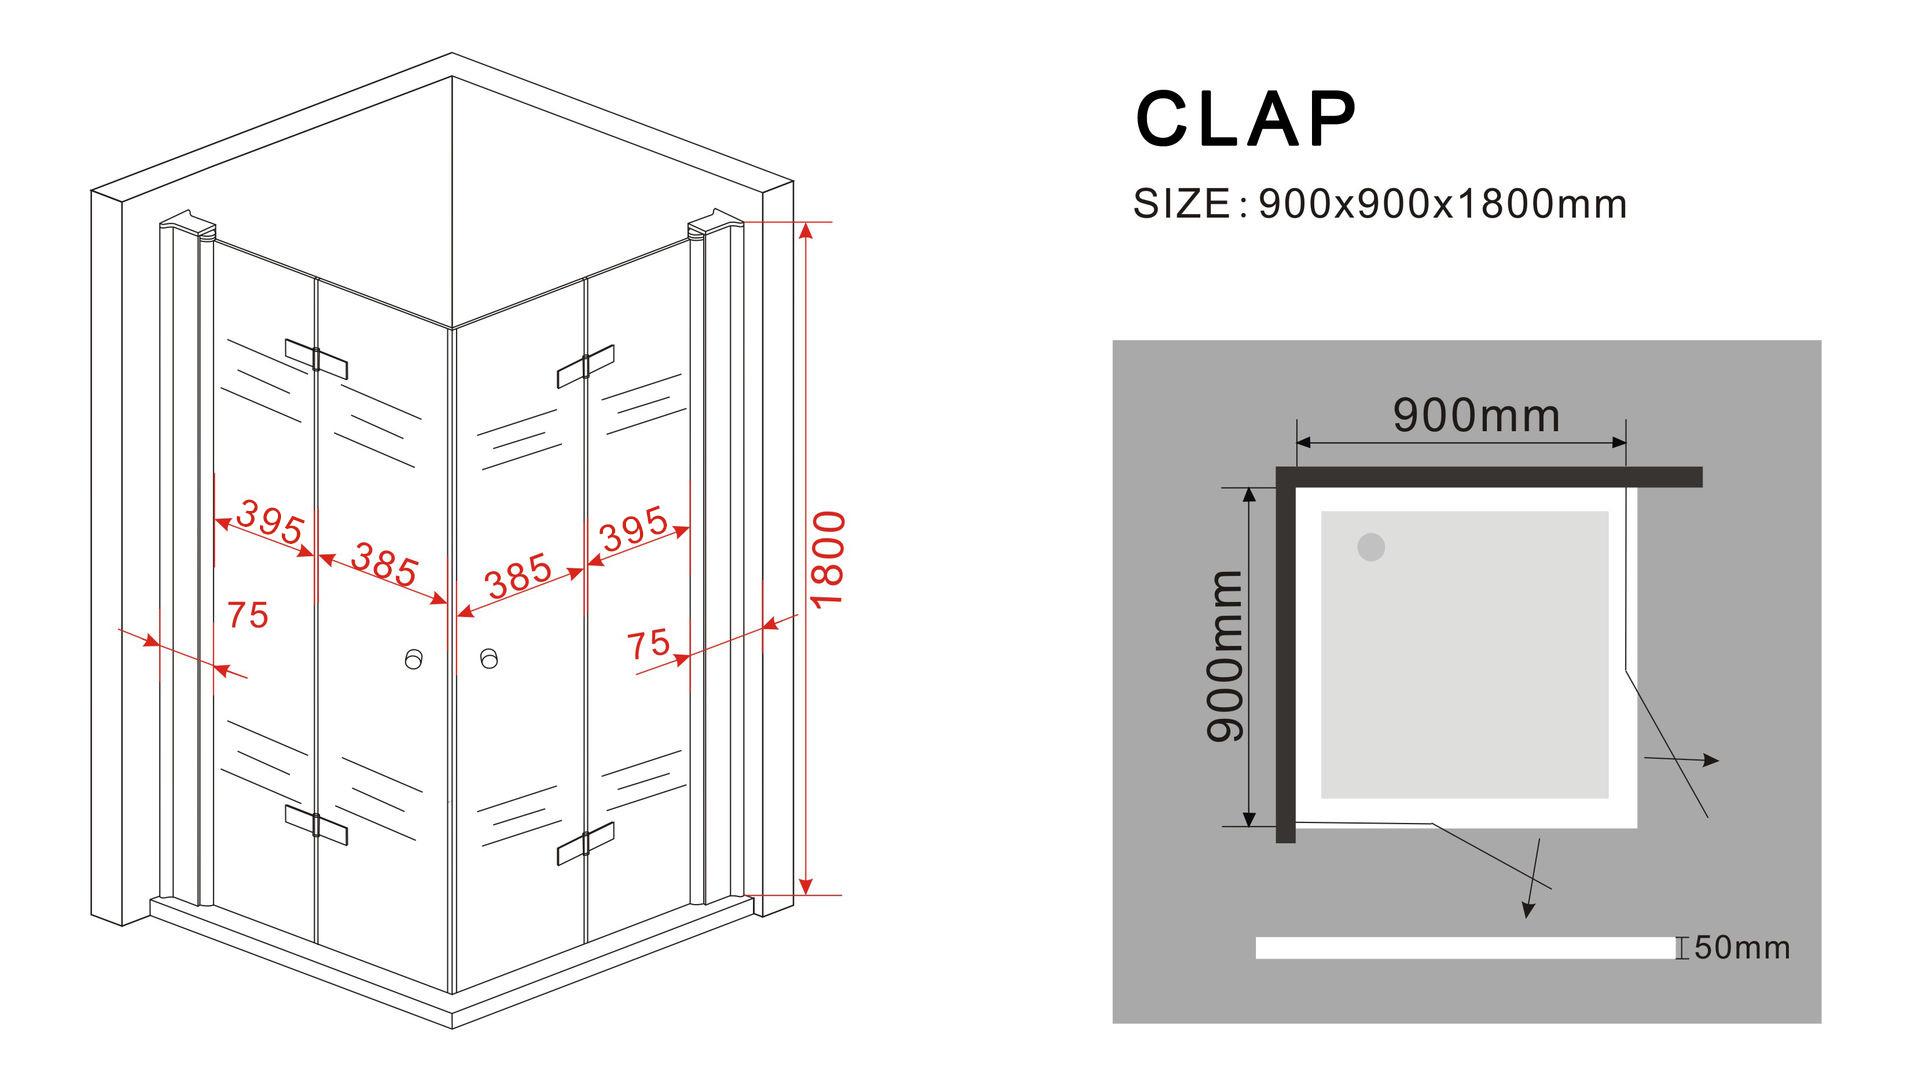 duschkabine clap 90 x 90 x 180 cm ohne duschtasse glasdeals. Black Bedroom Furniture Sets. Home Design Ideas